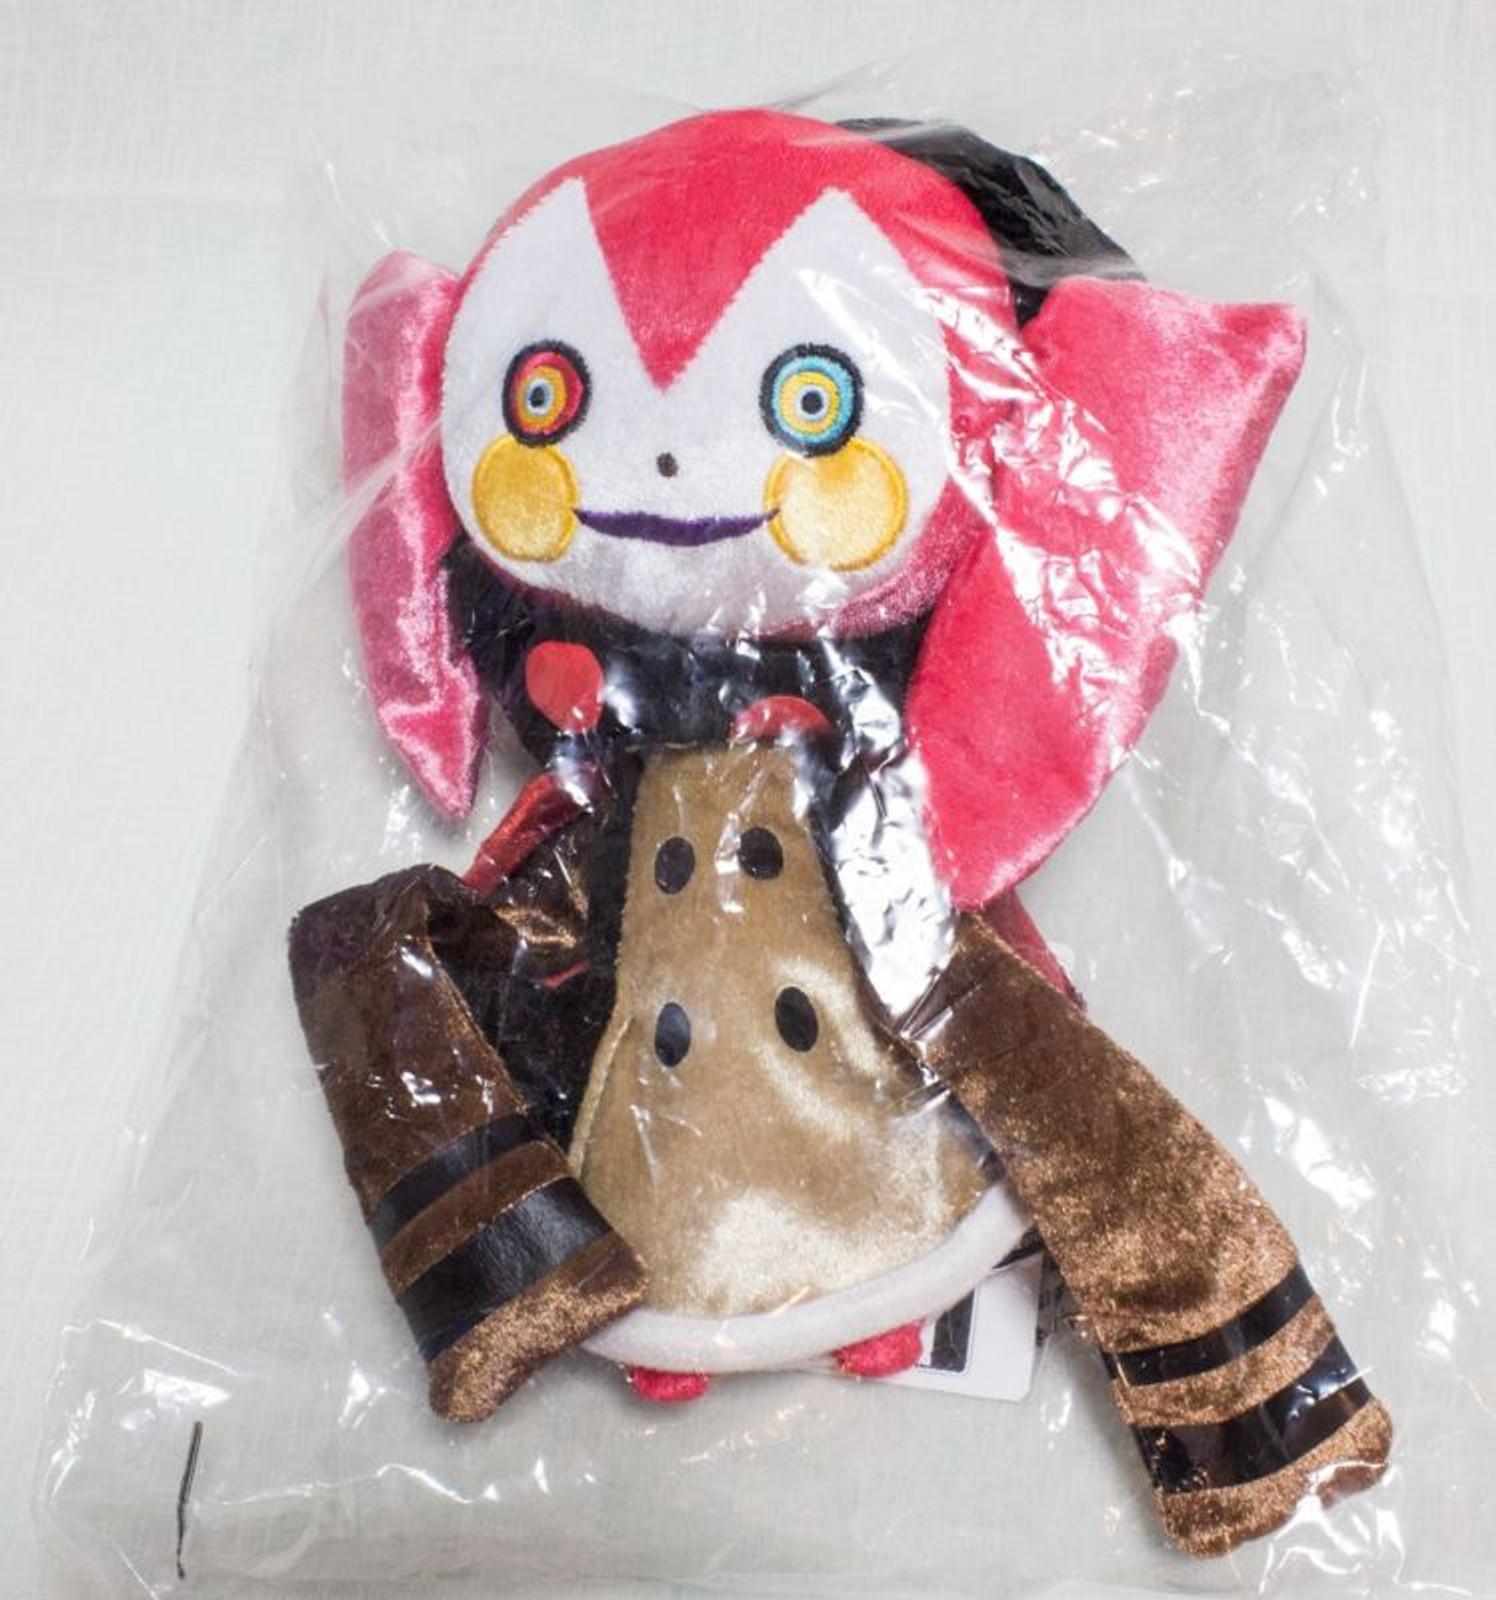 Puella Magi Madoka Magica Sweet Witch Plush Doll Ichiban Kuji JAPAN ANIME MANGA